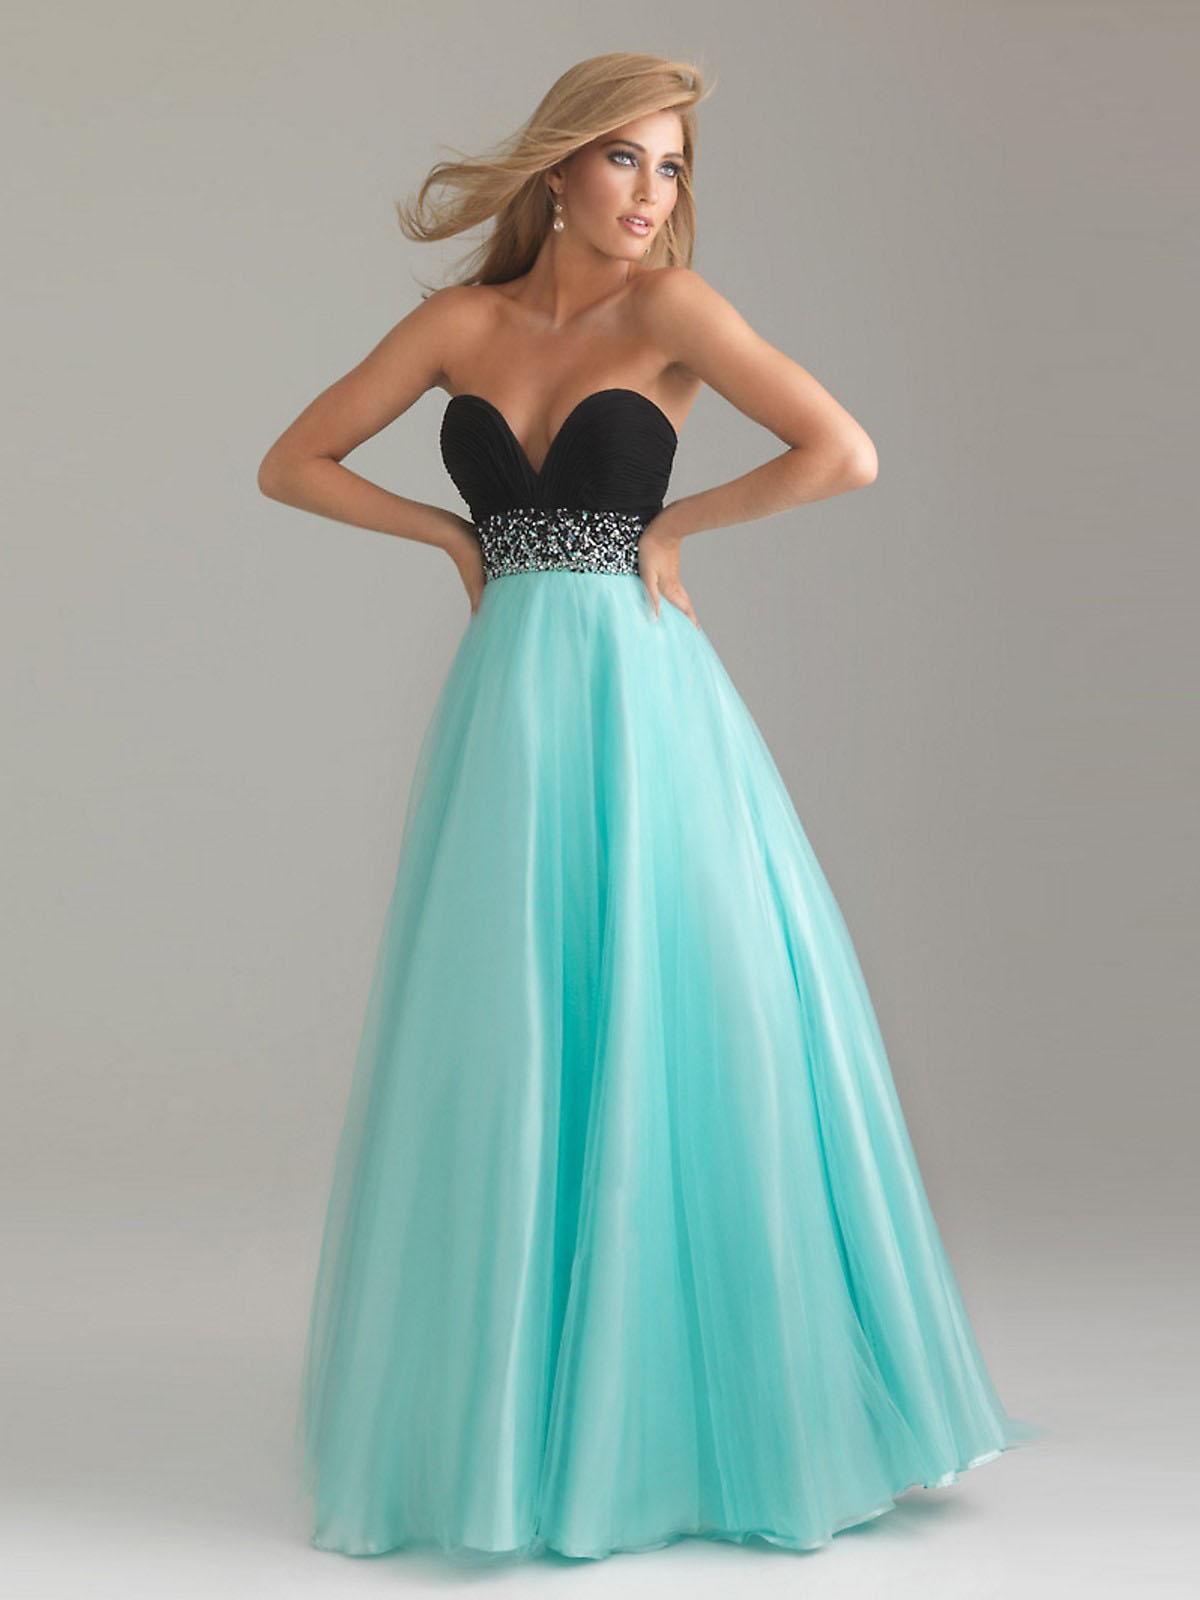 Sweet Wedding Memory: Popular Strapless Prom Dresses